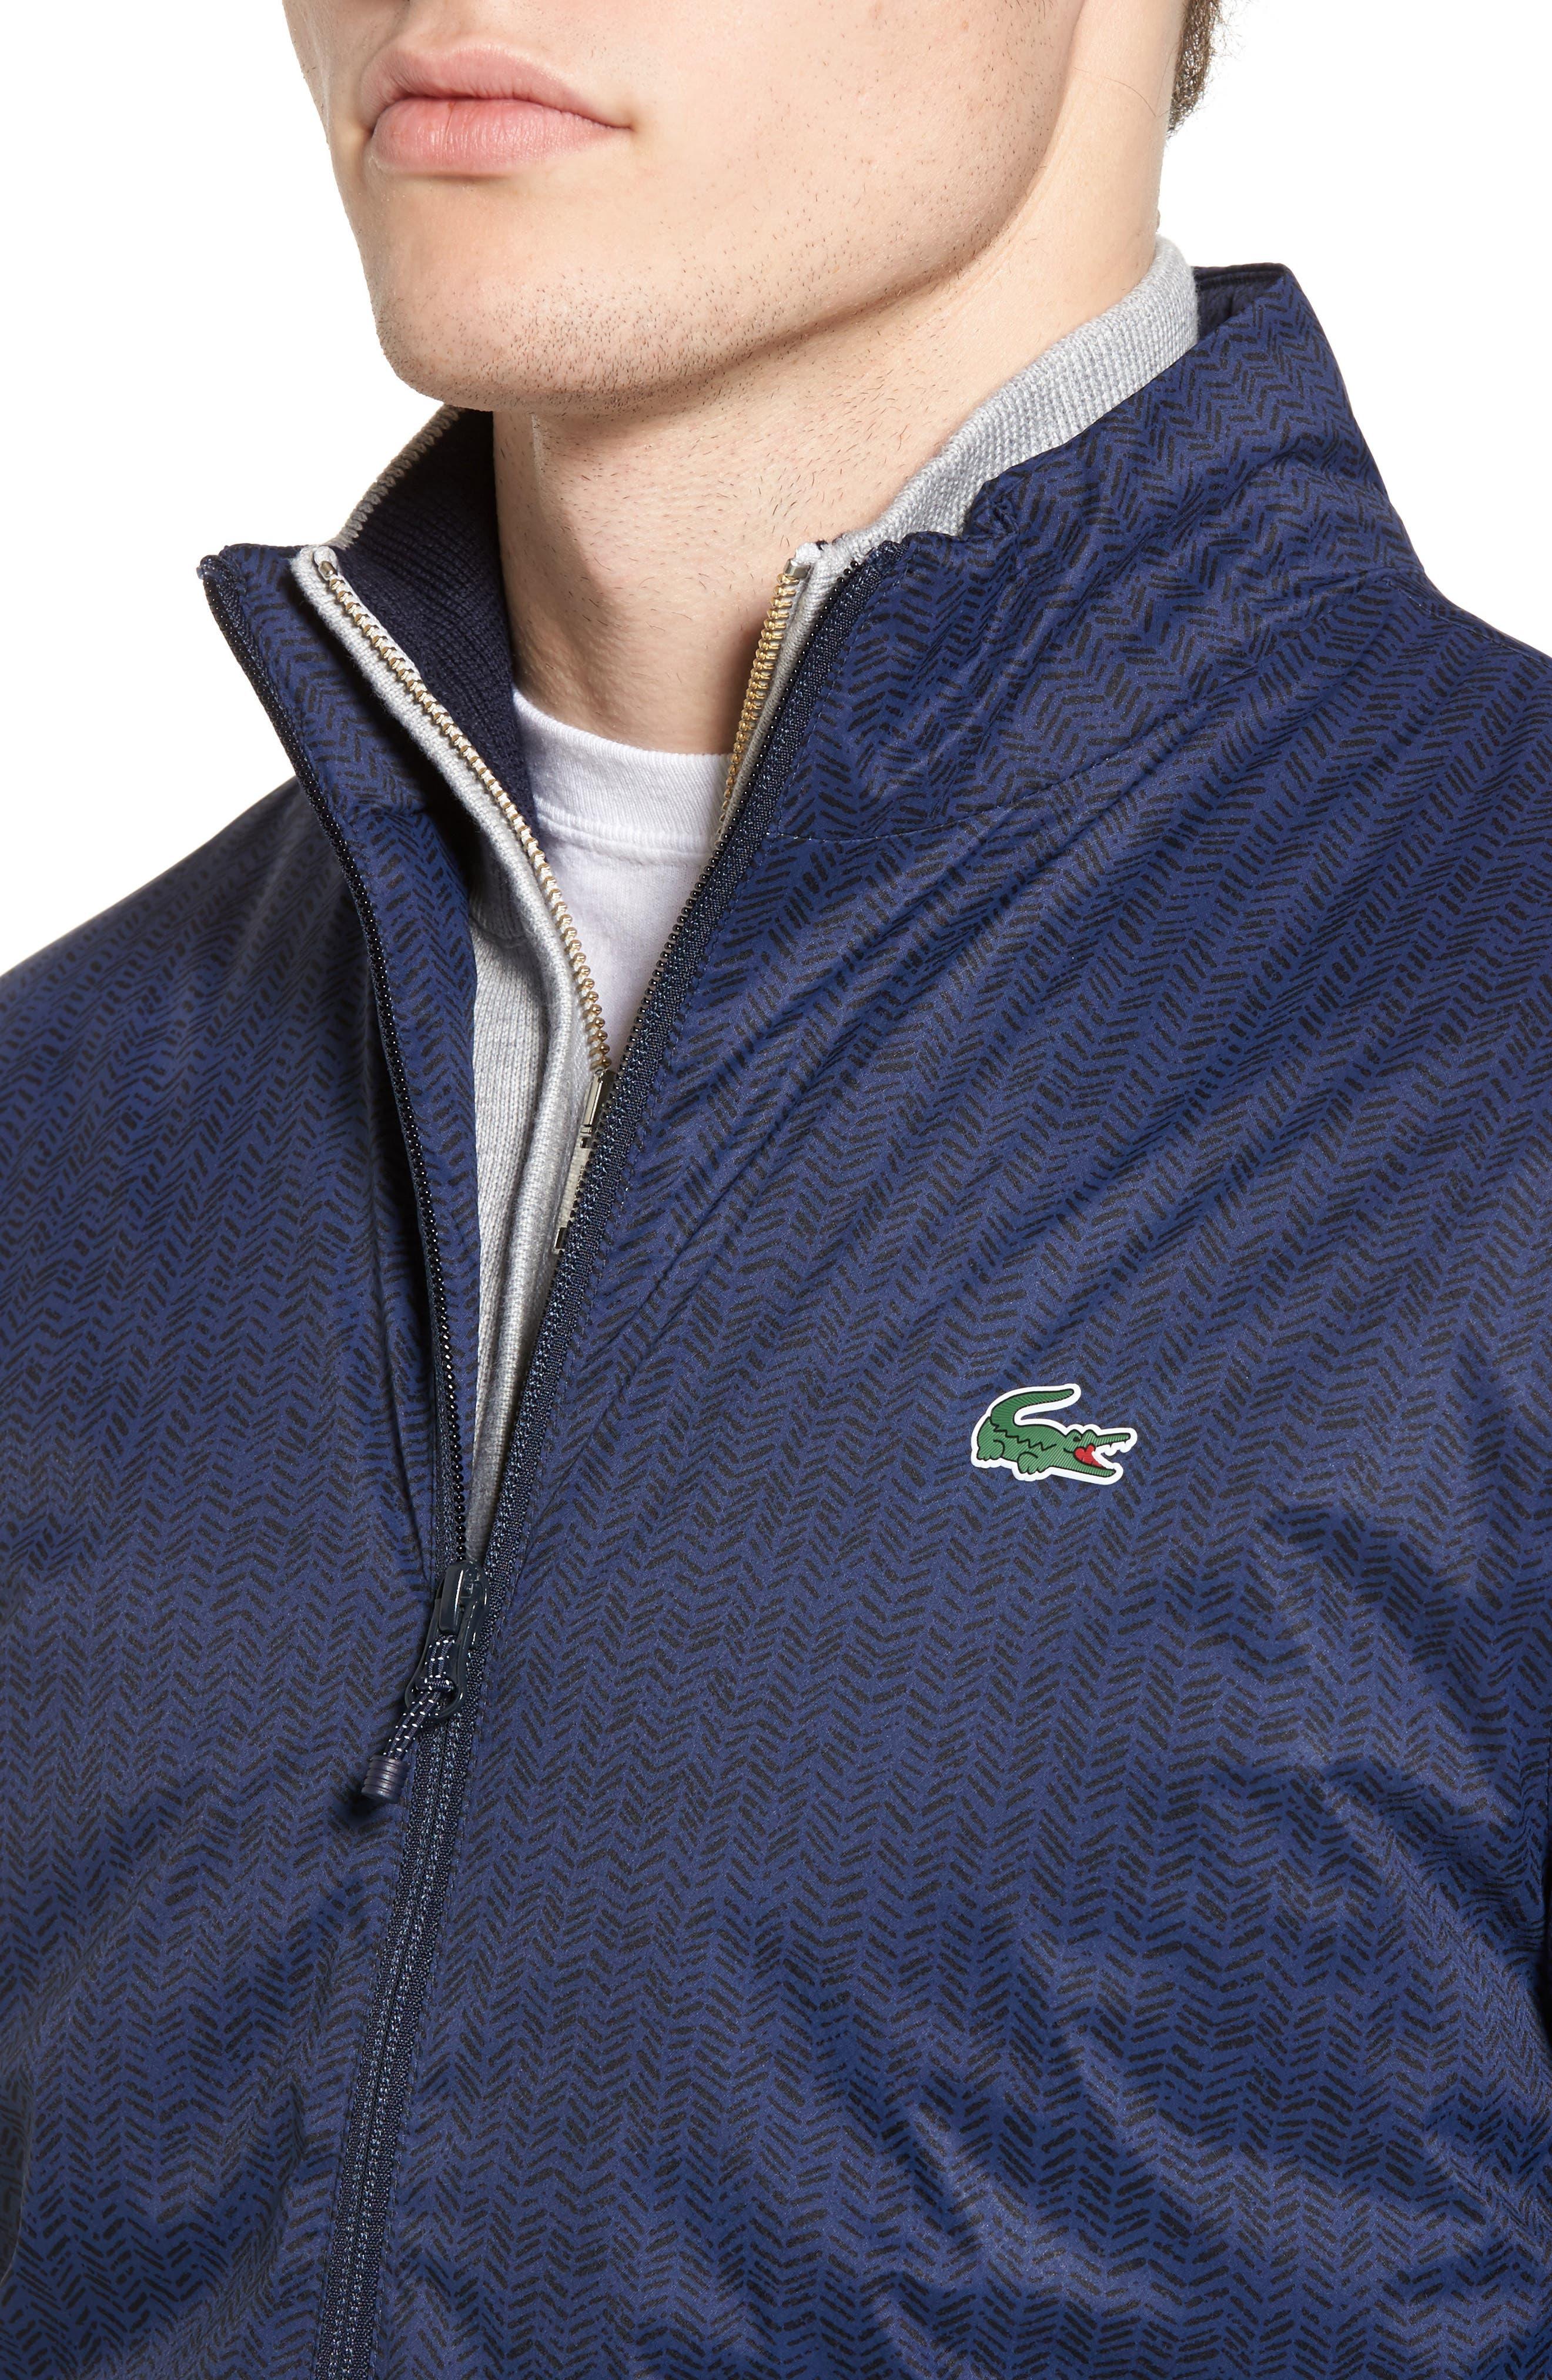 Herringbone Zip-Up Jacket,                             Alternate thumbnail 4, color,                             Navy Blue/ Navy Blue